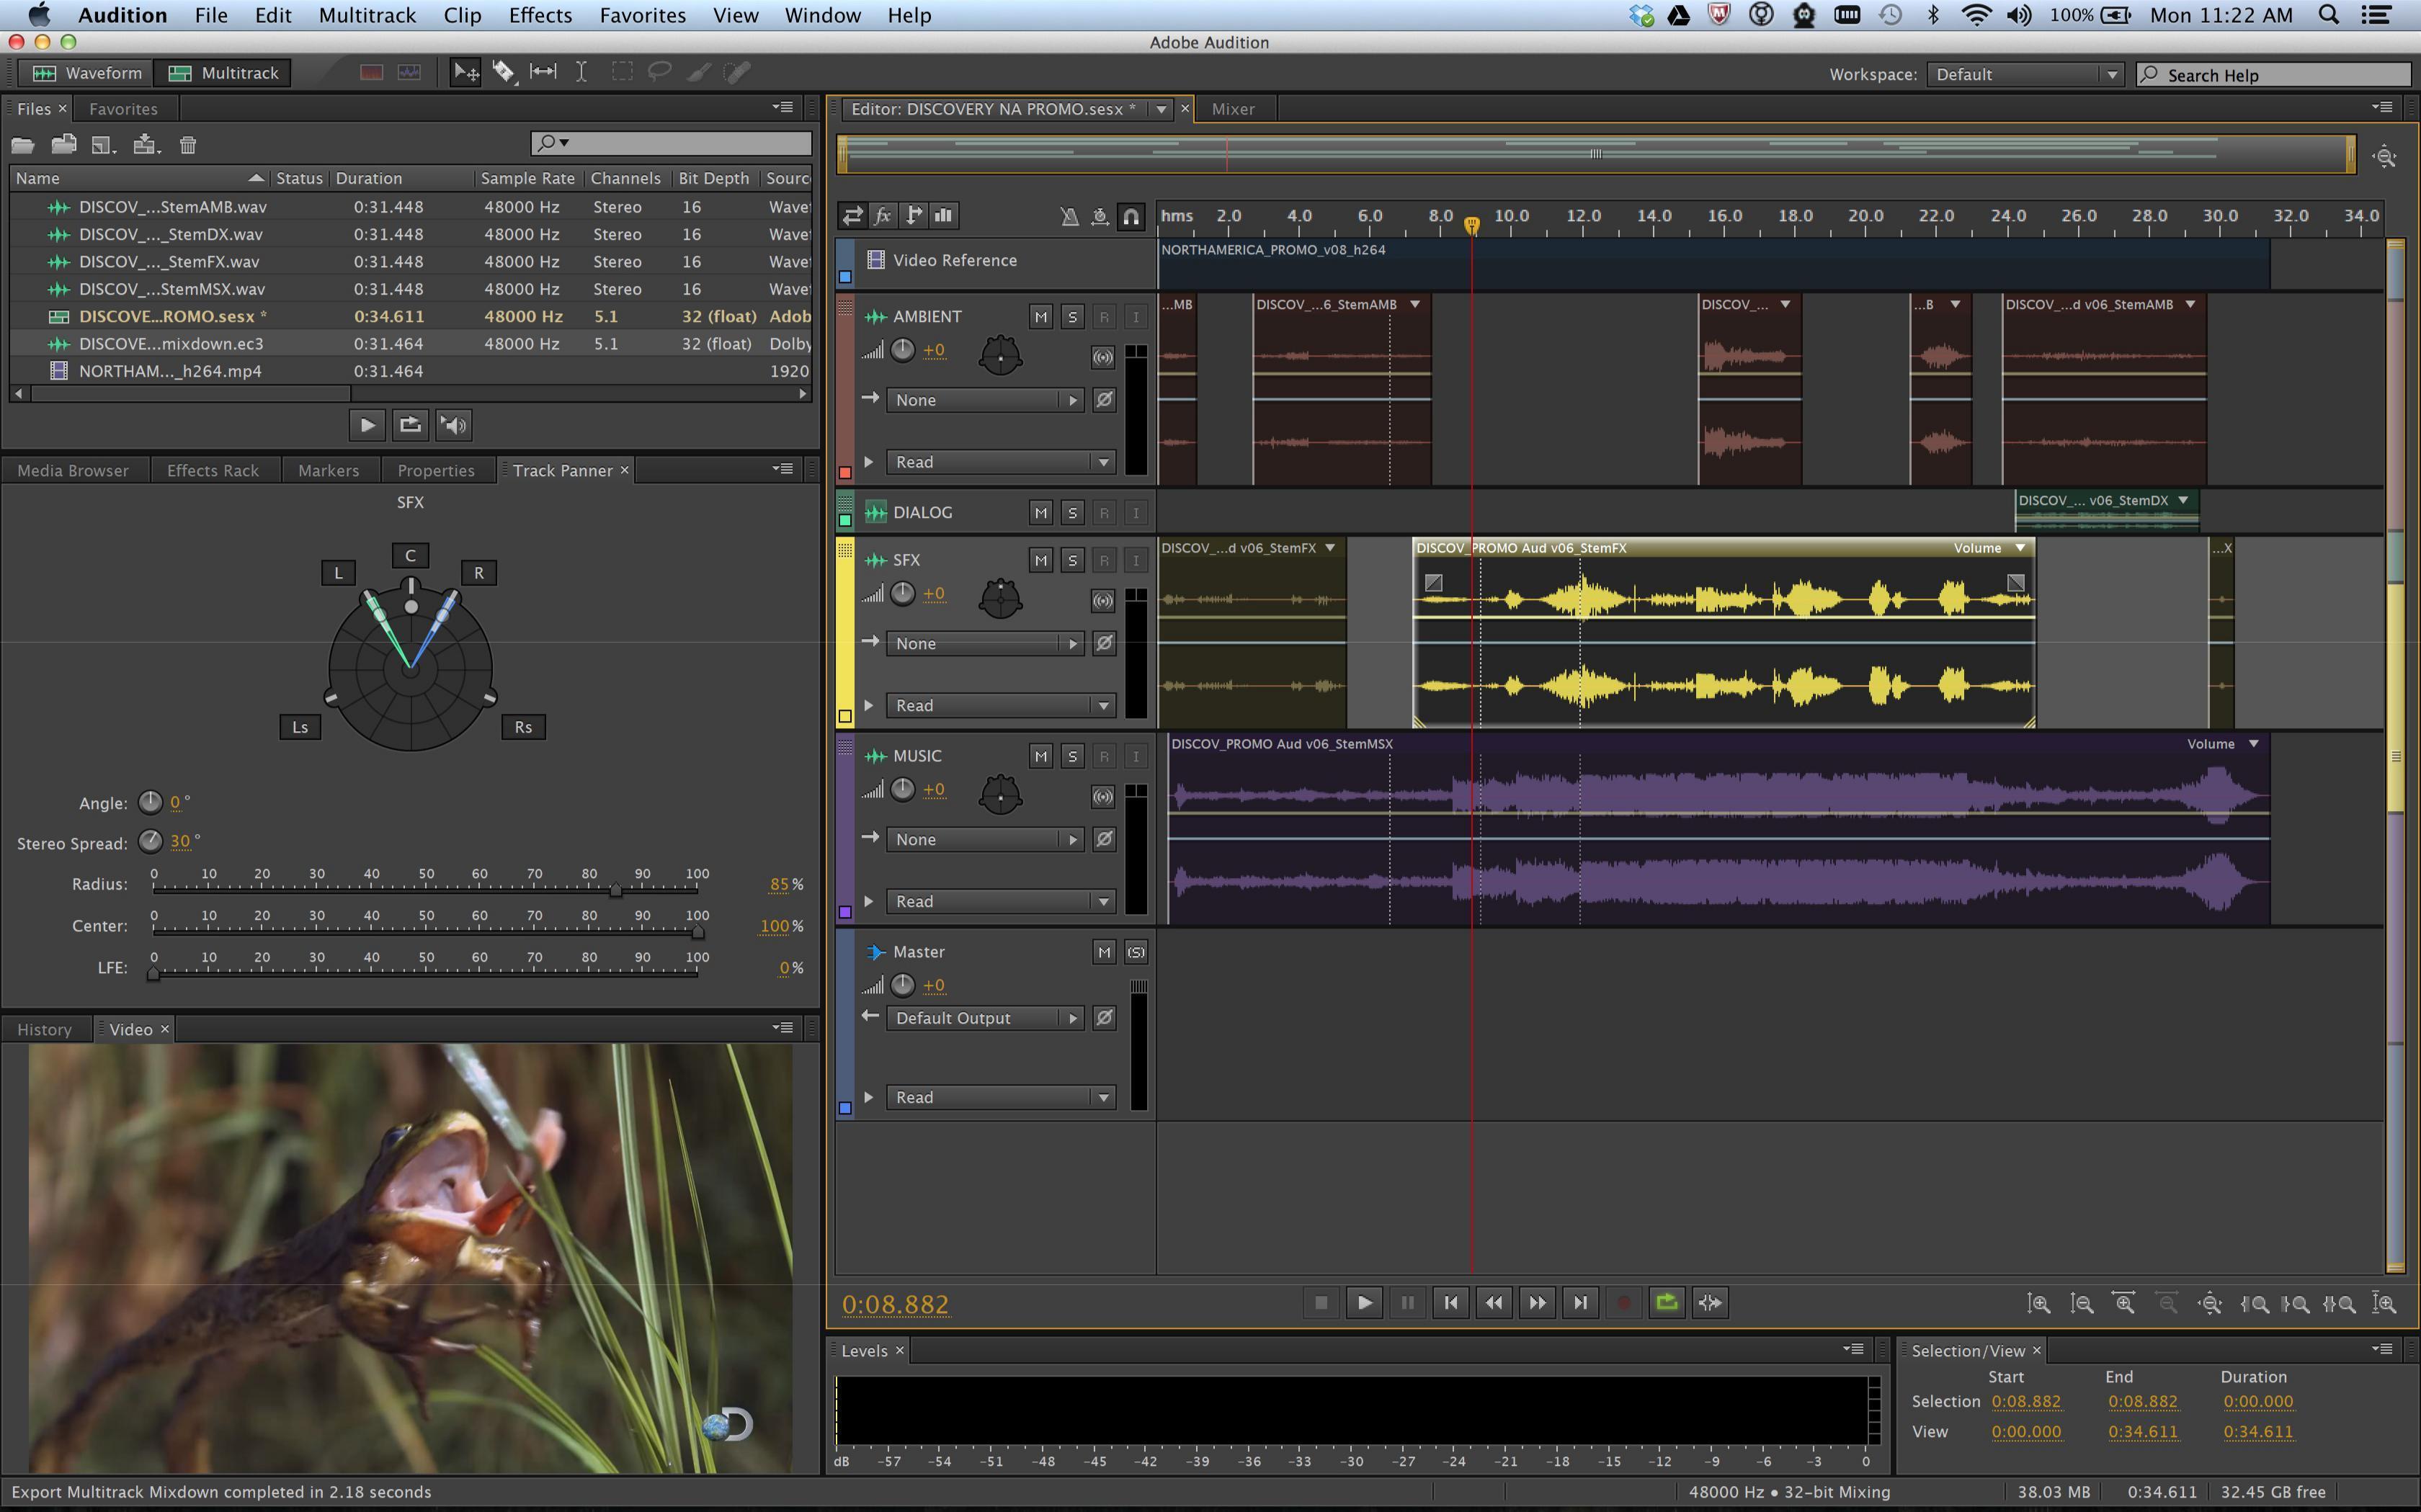 Adobe Audition CC mac